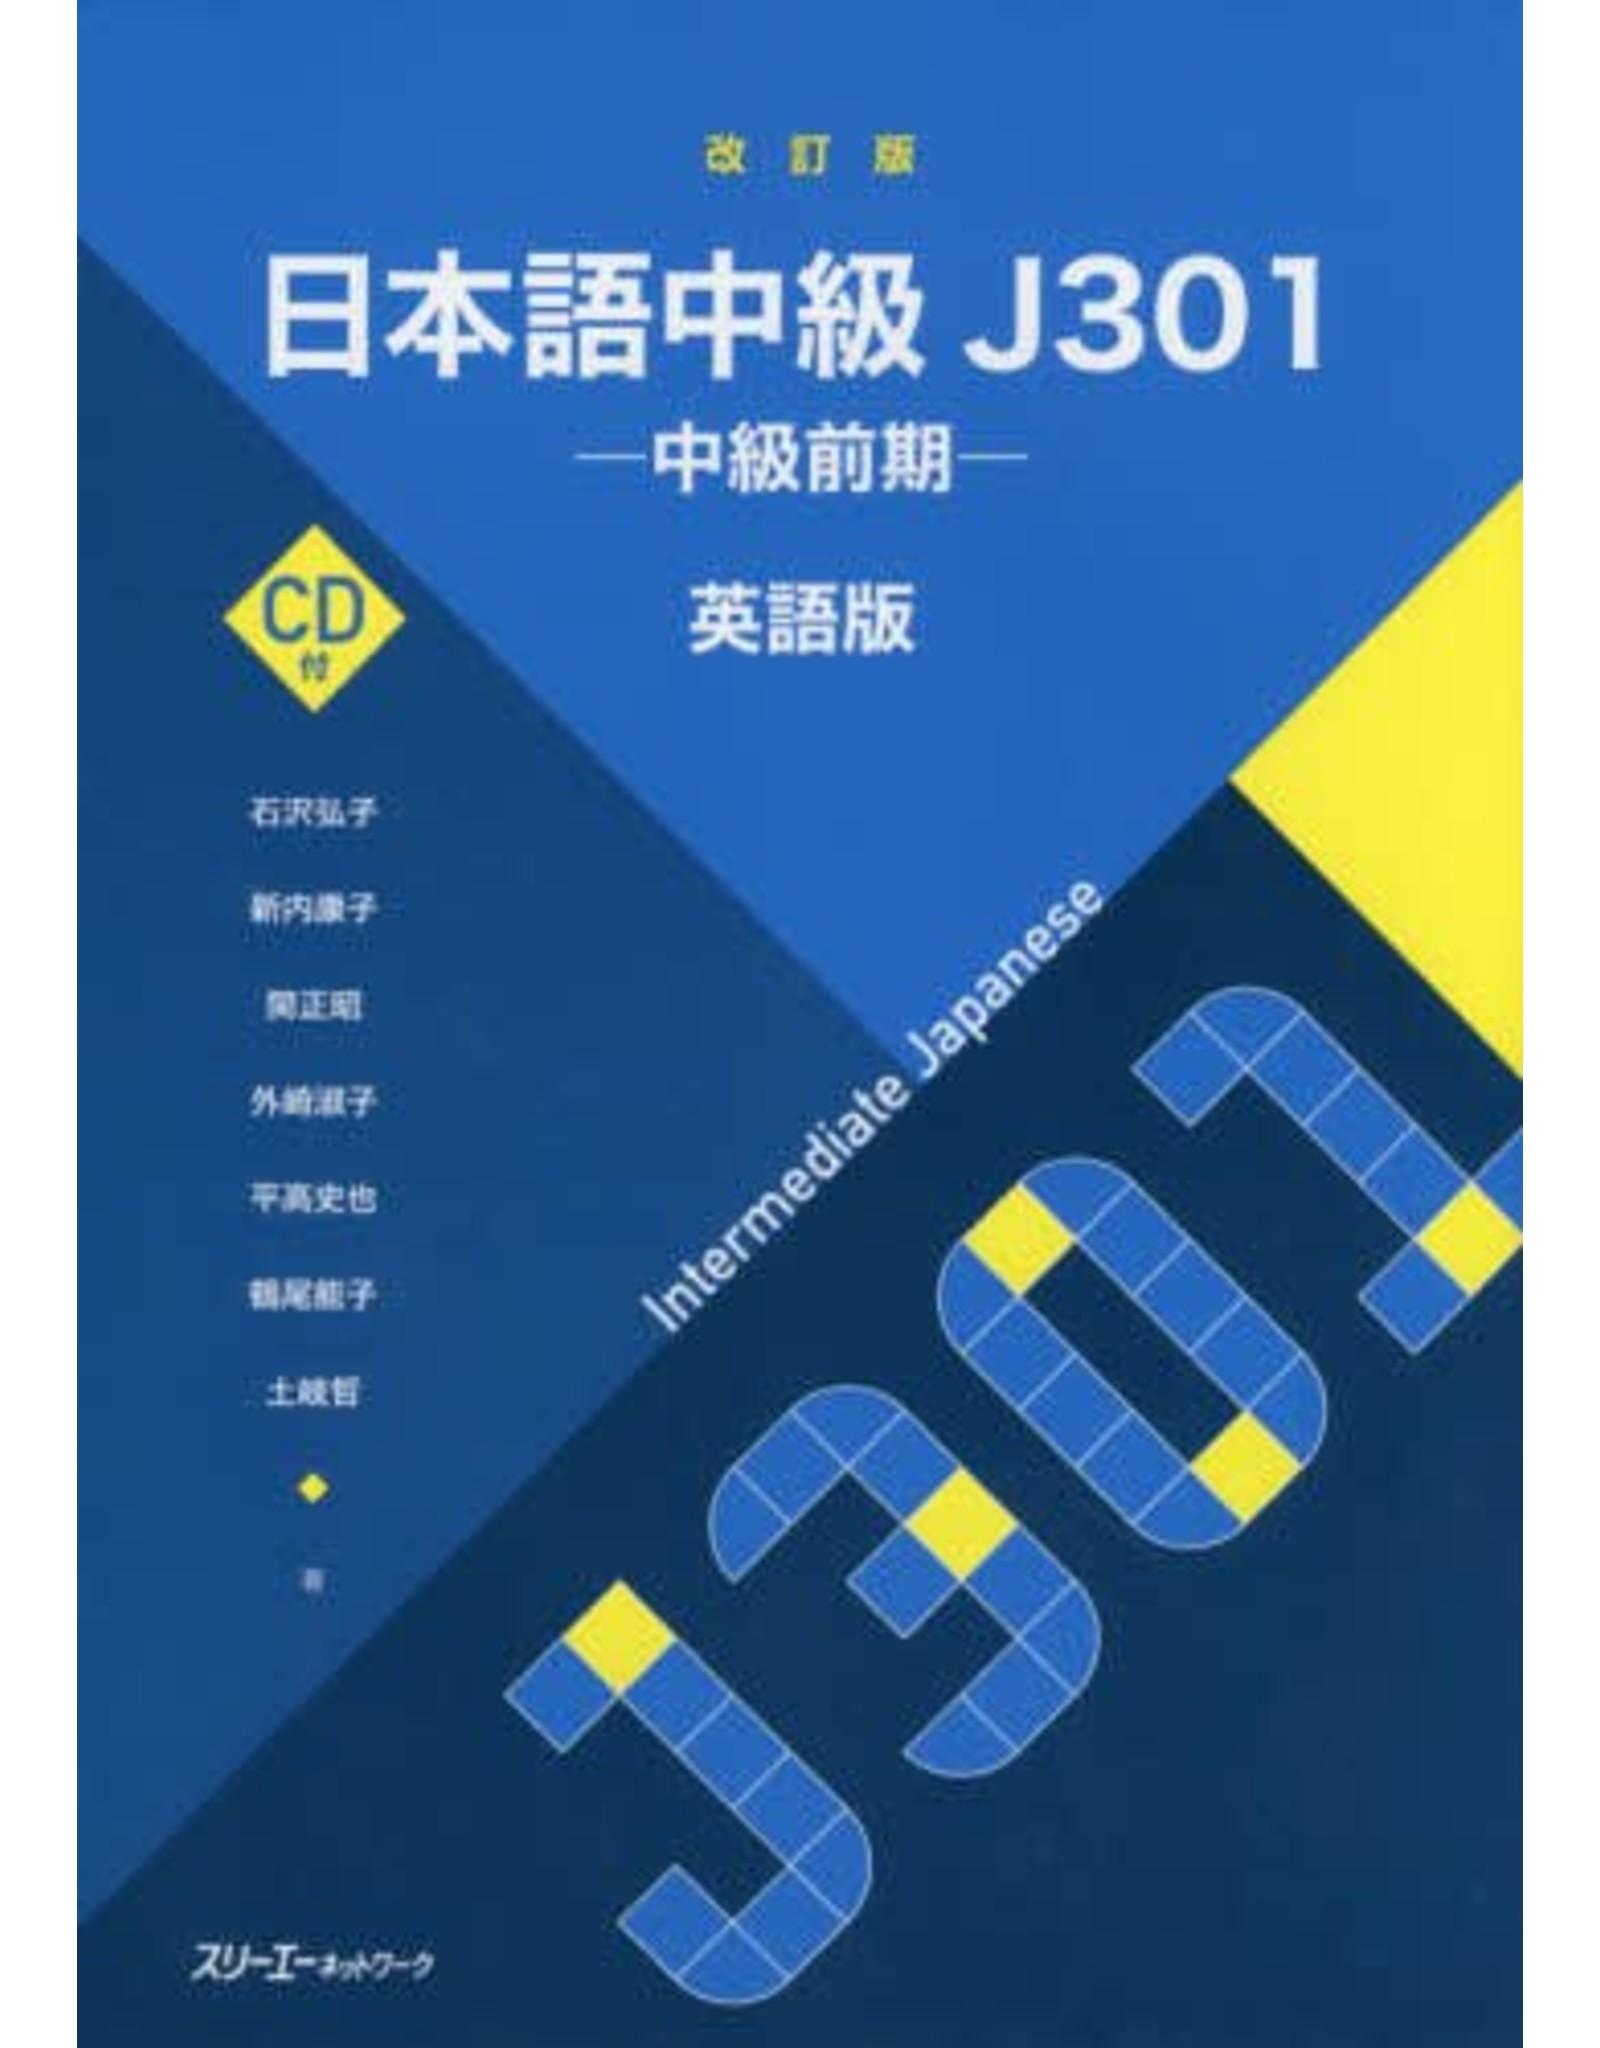 3A Corporation NIHONGO CHUKYU J301: TEXTBOOK (ENGLISH) REVISED ED.